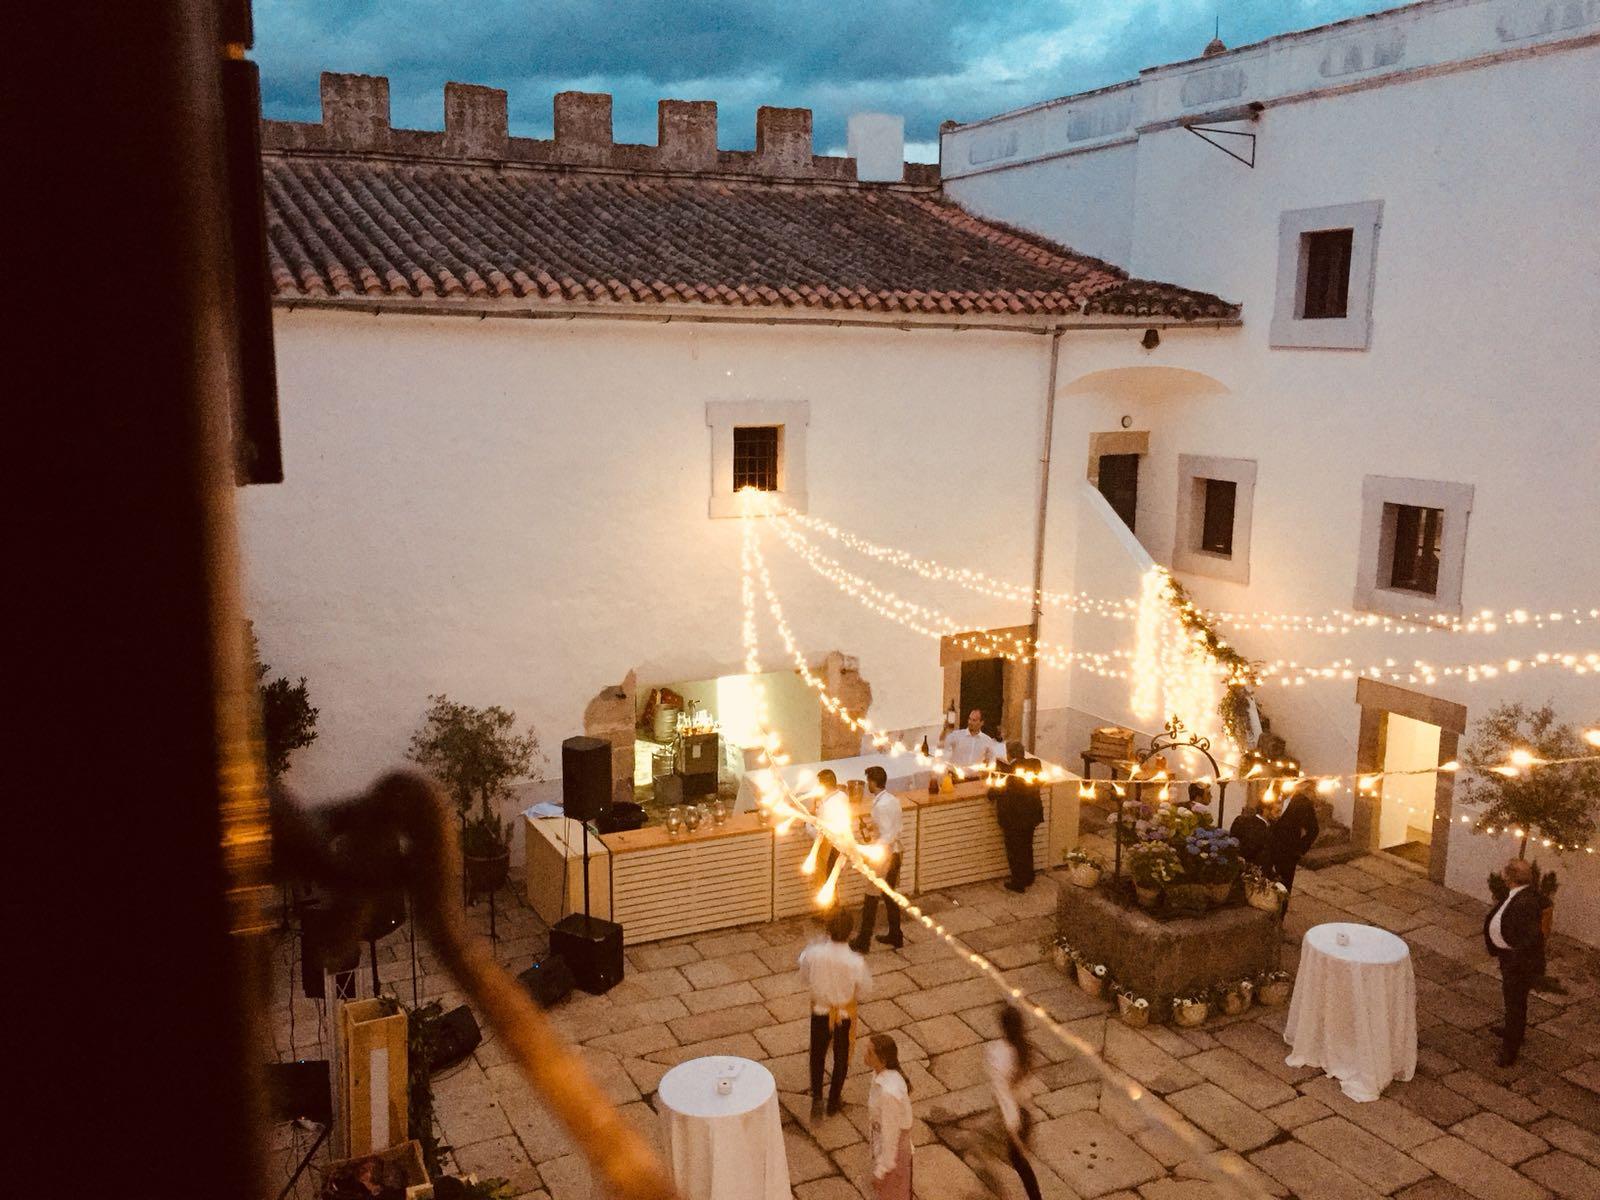 Barra libre en el Castillo de Cáceres